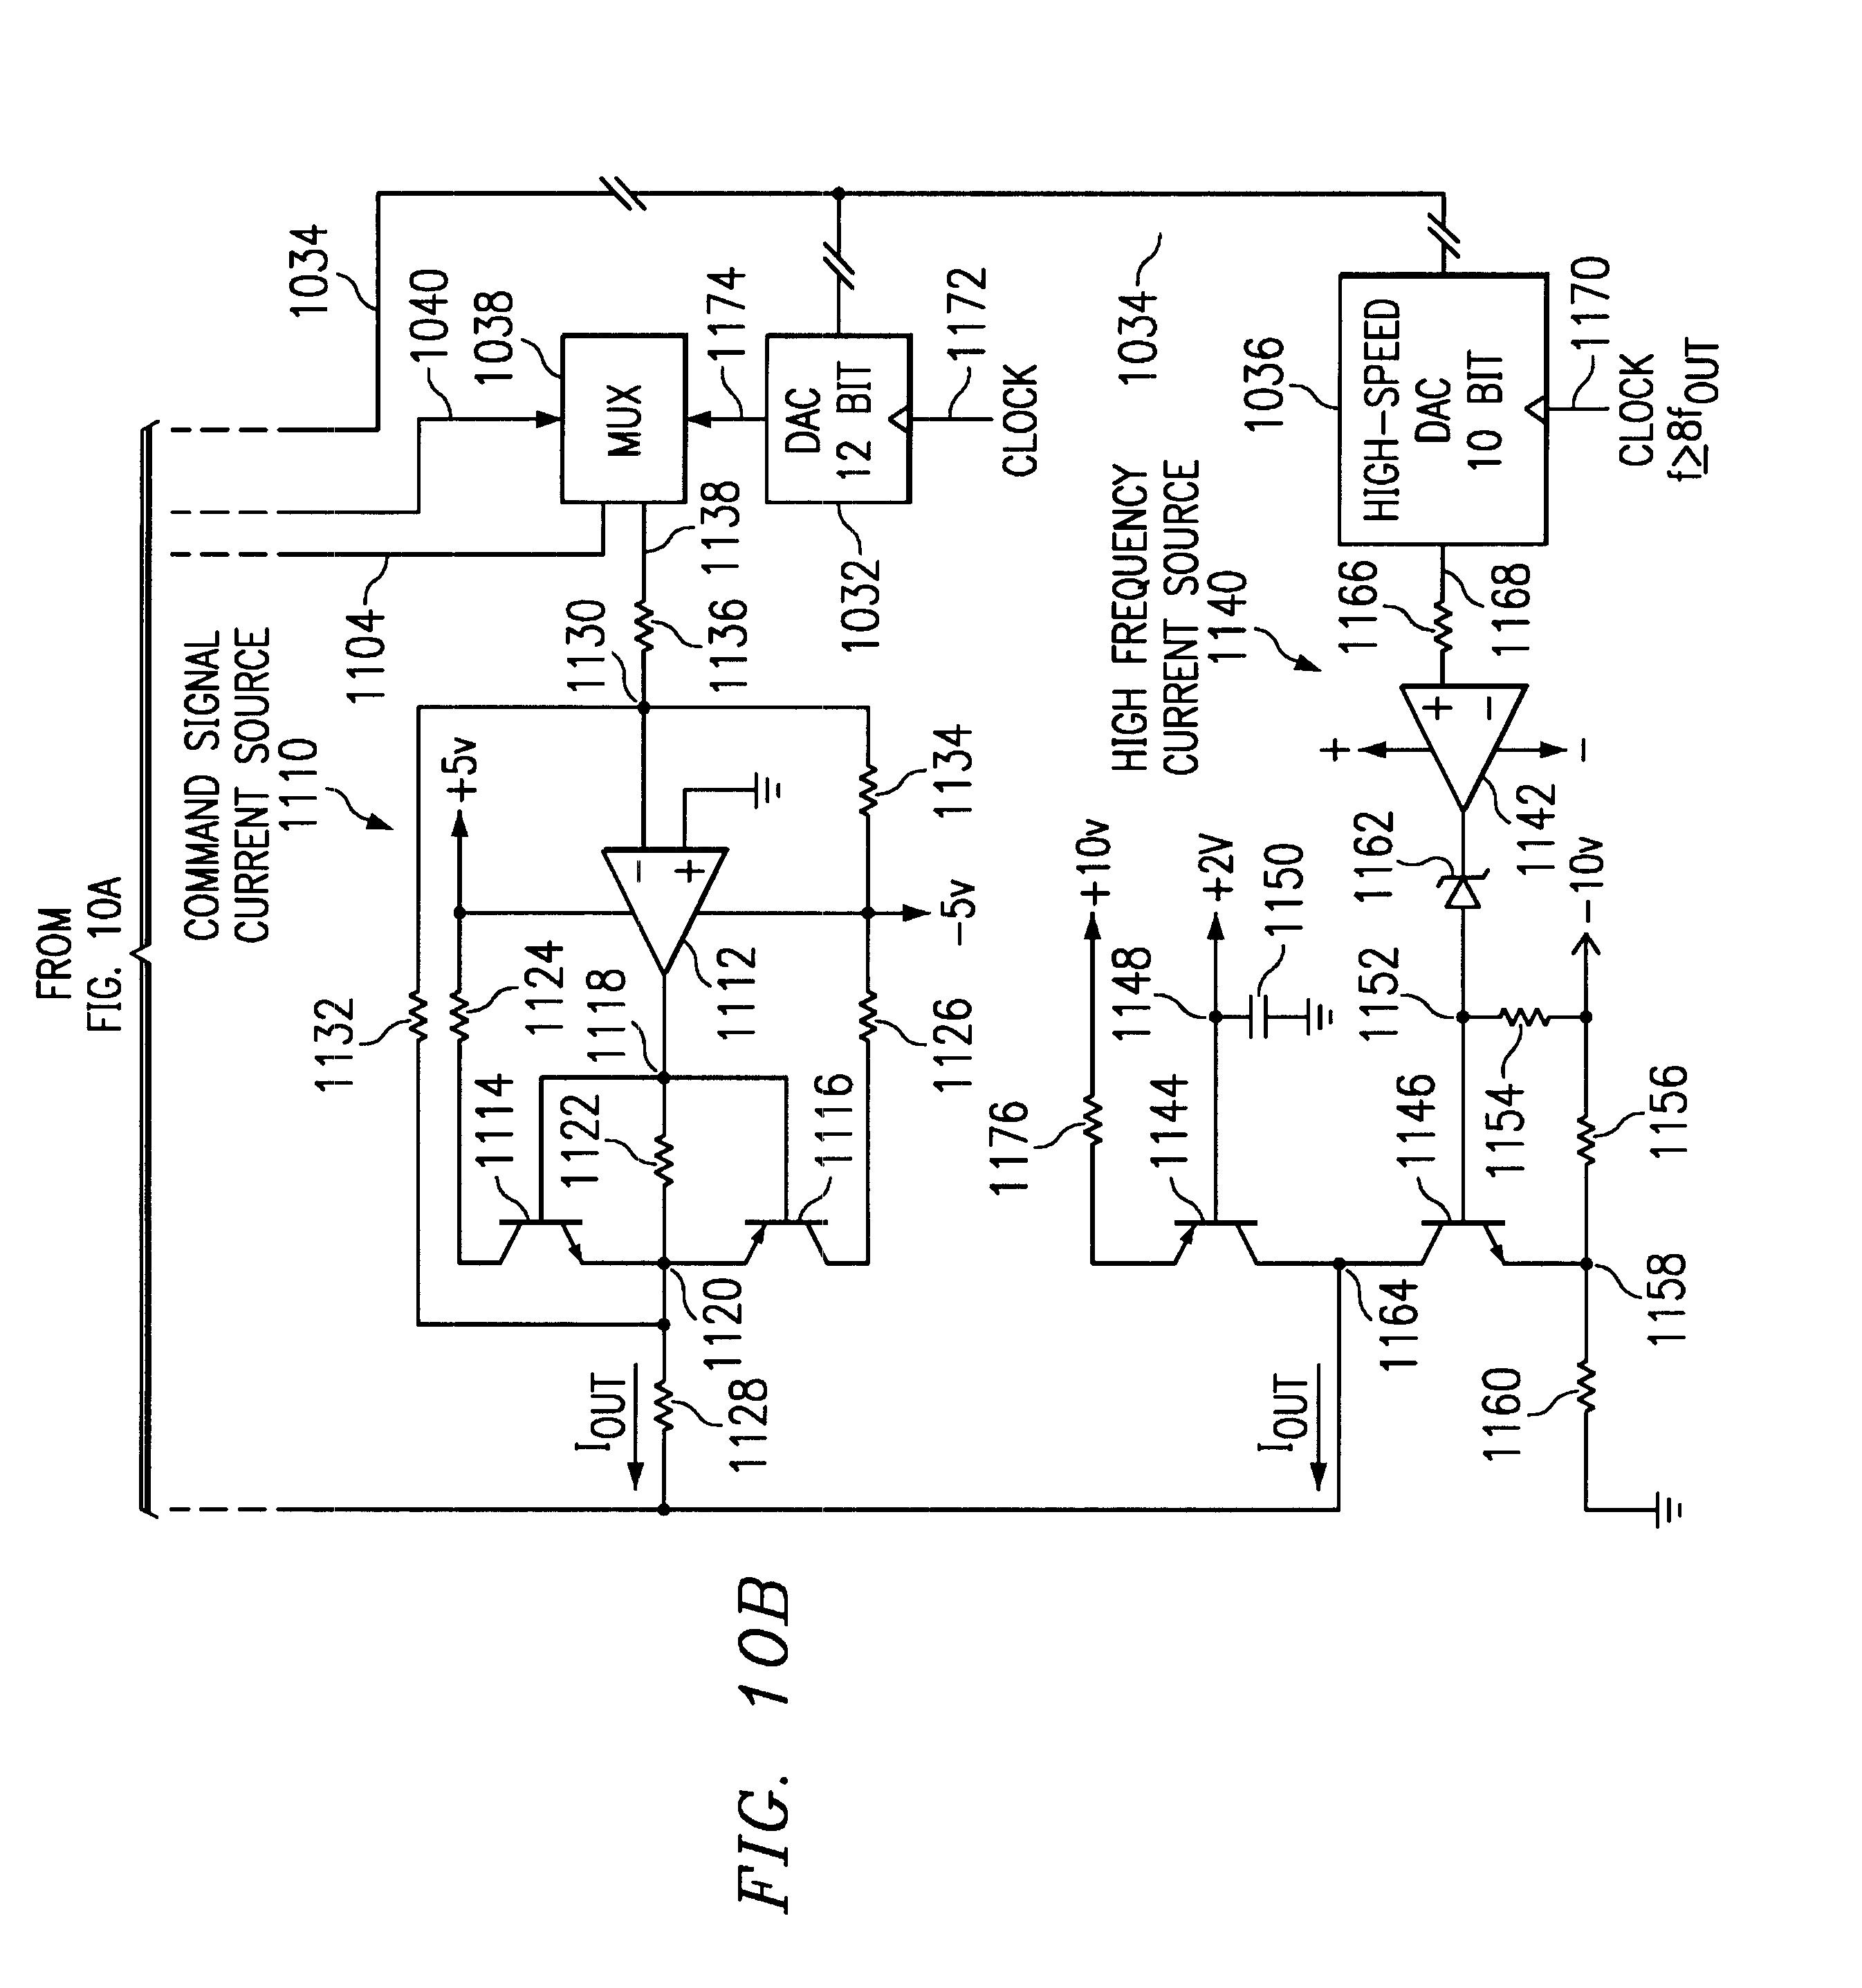 120v Gfci Breaker Wiring Diagram